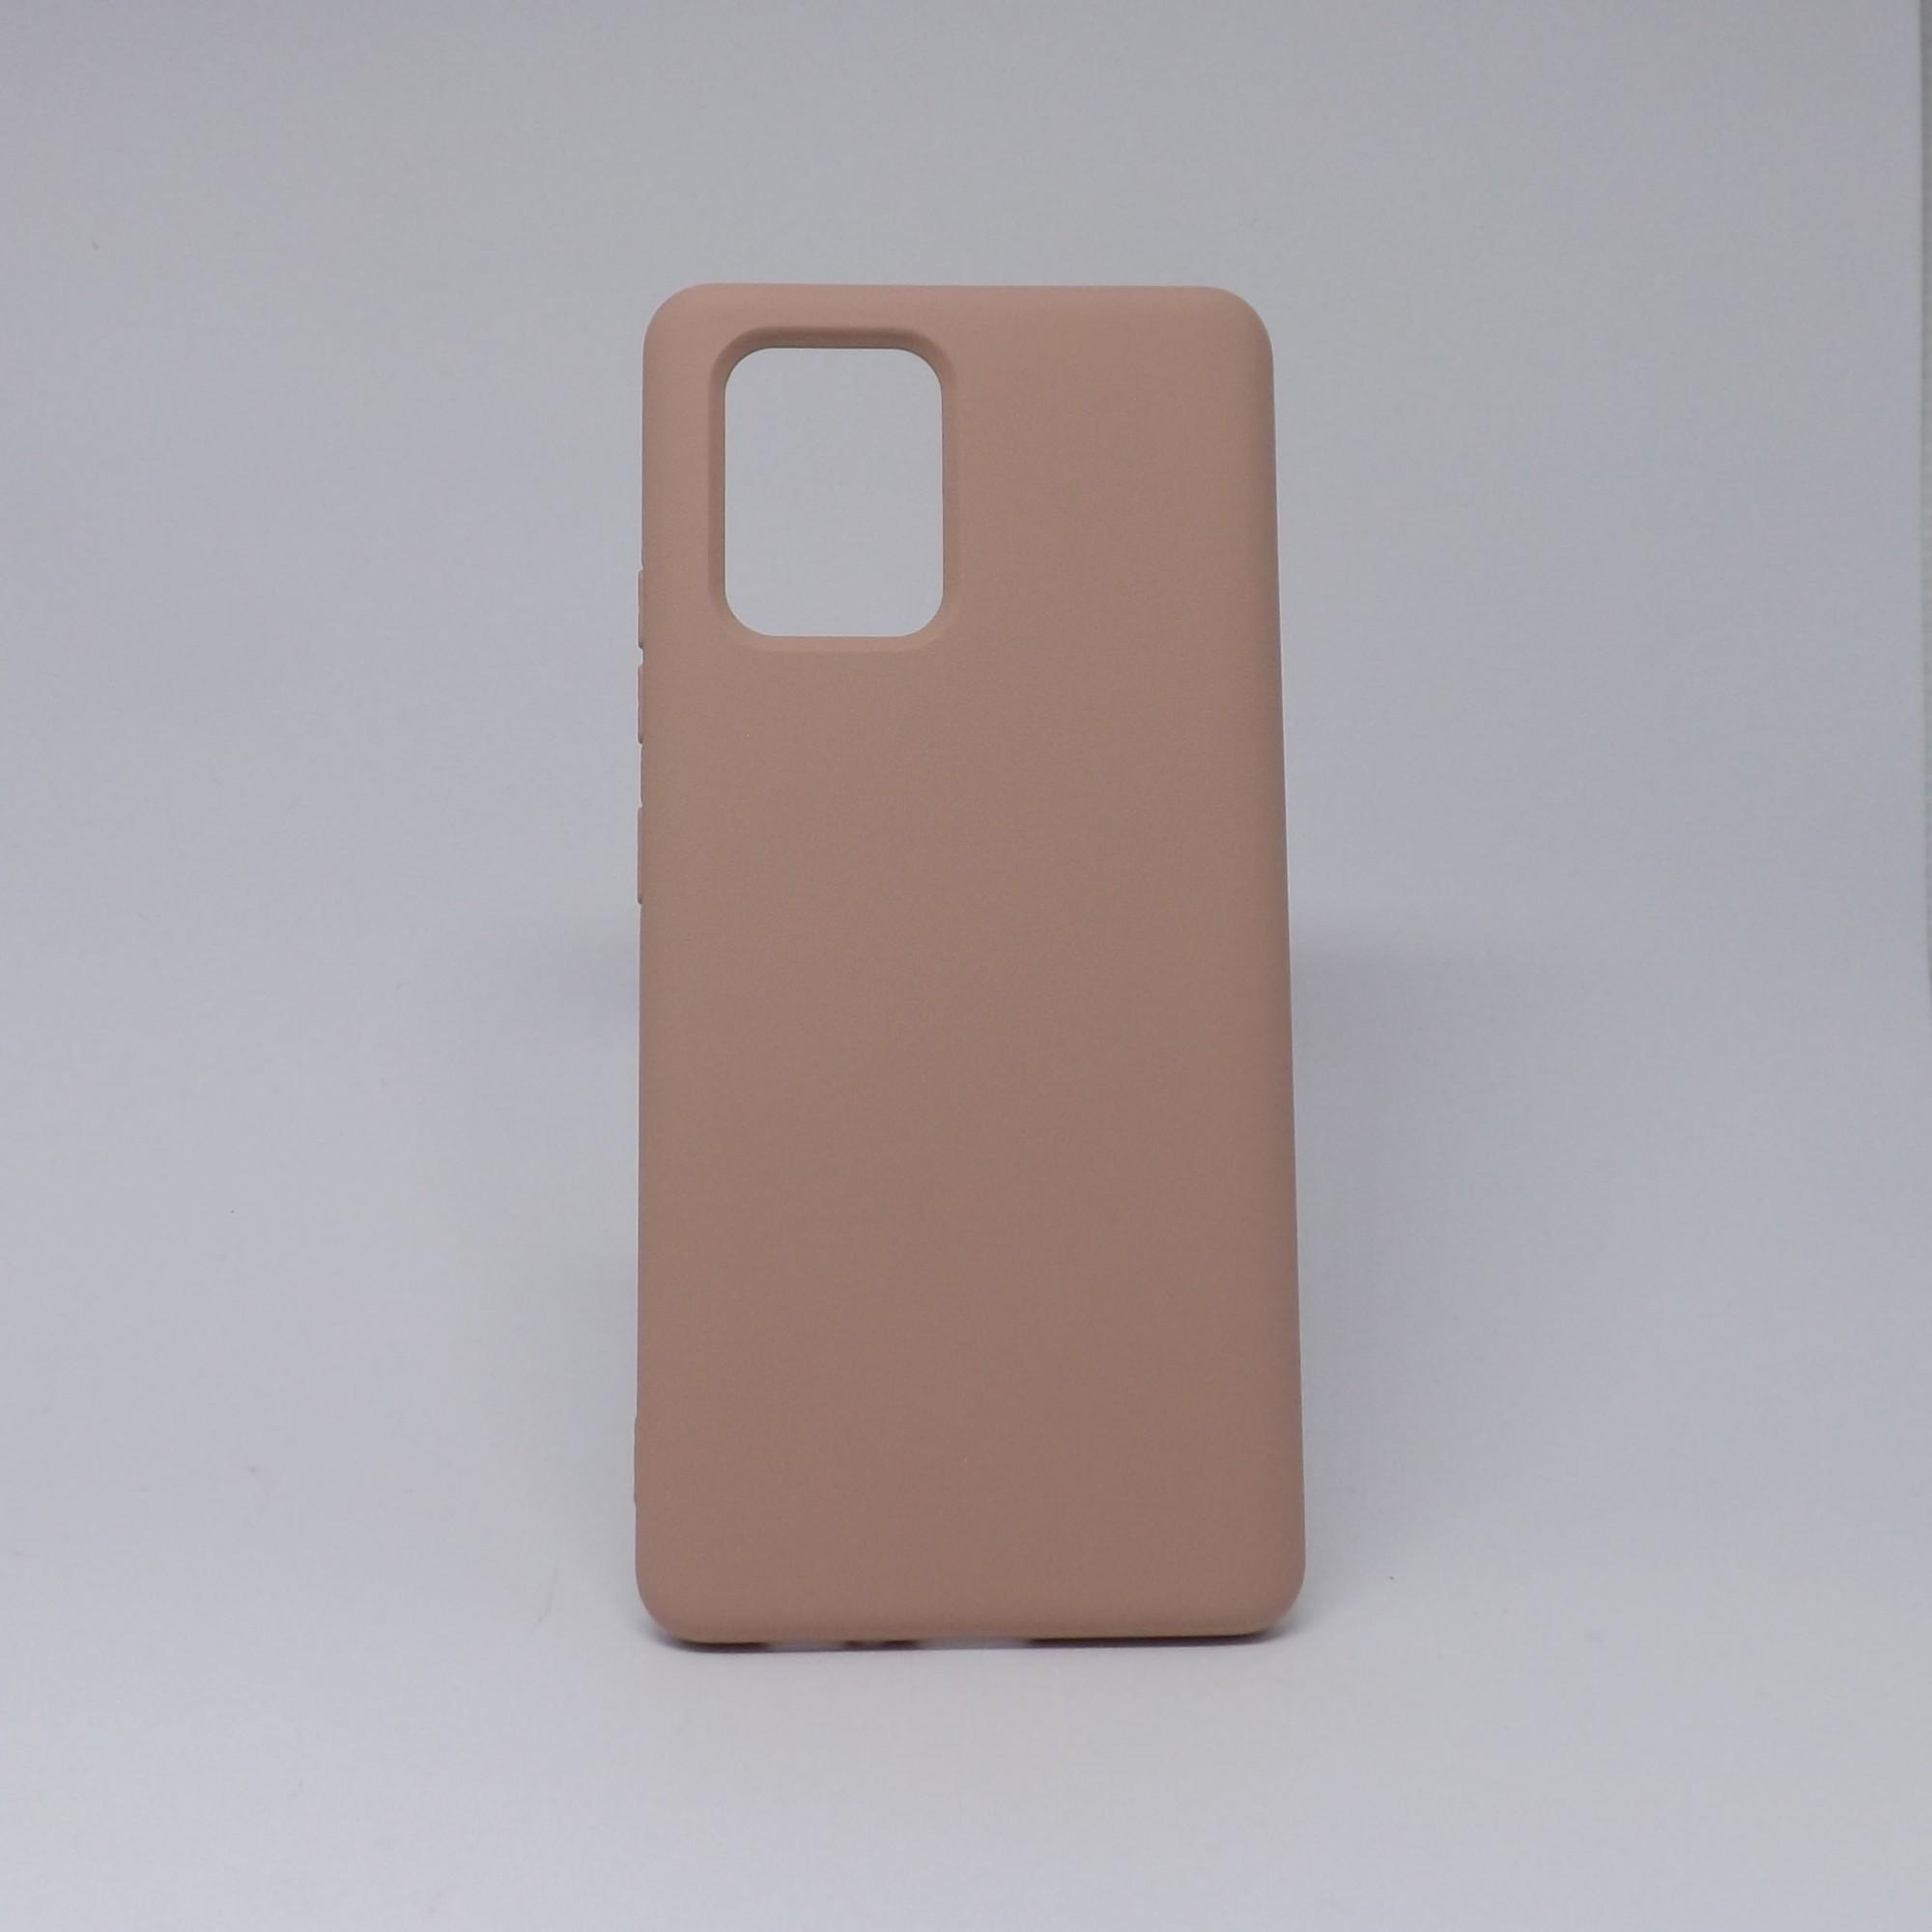 Capa Samsung Galaxy S10 Lite Autêntica